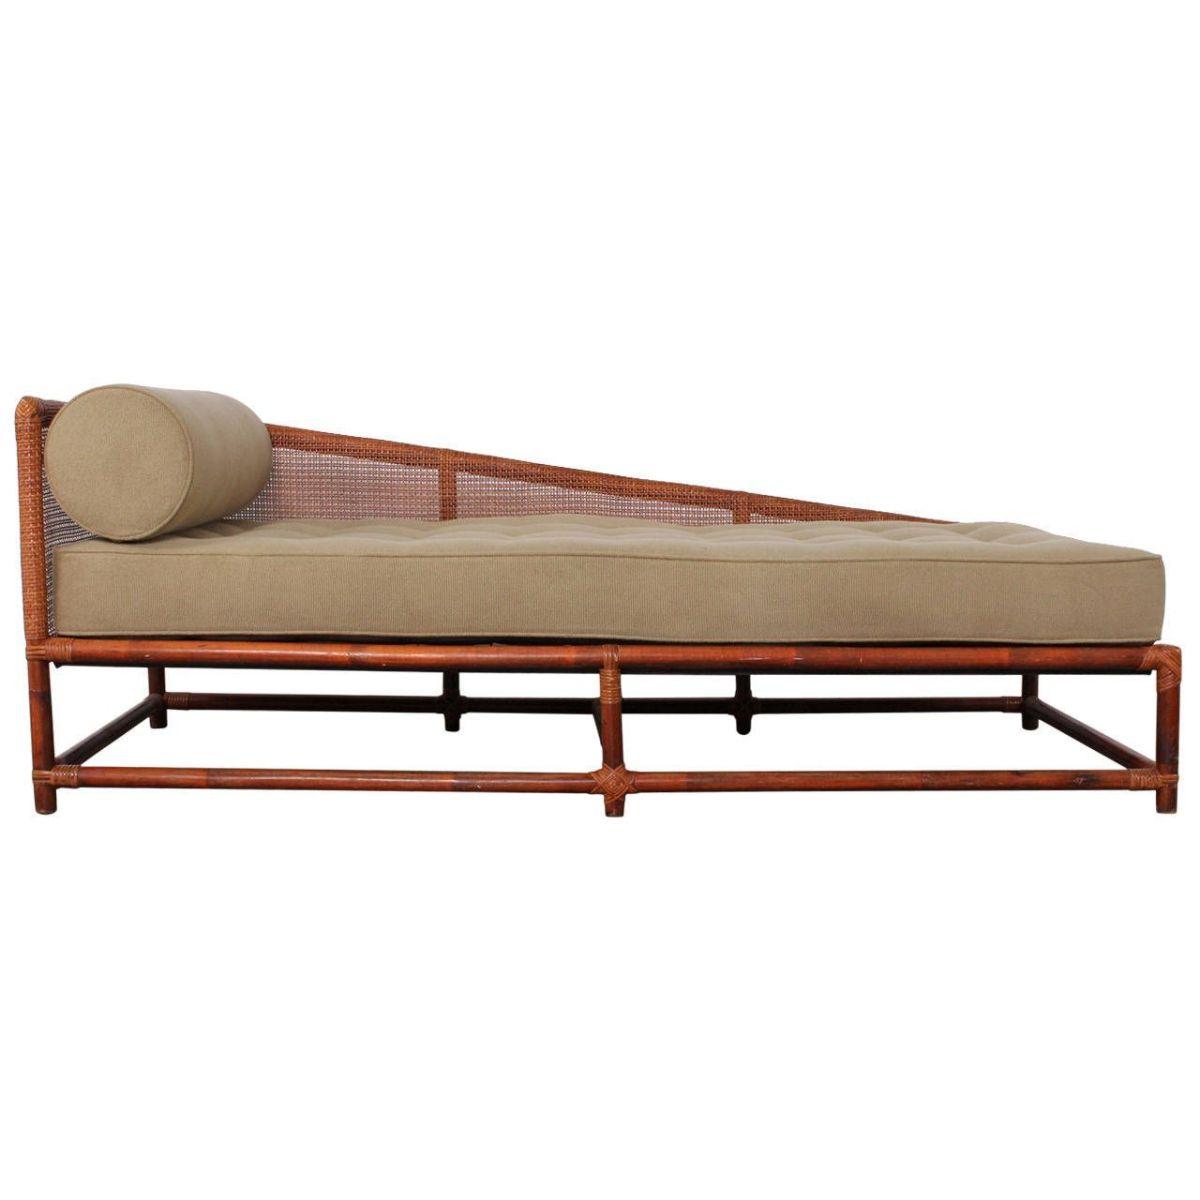 Unique bamboo sofa chair designs ideas 51